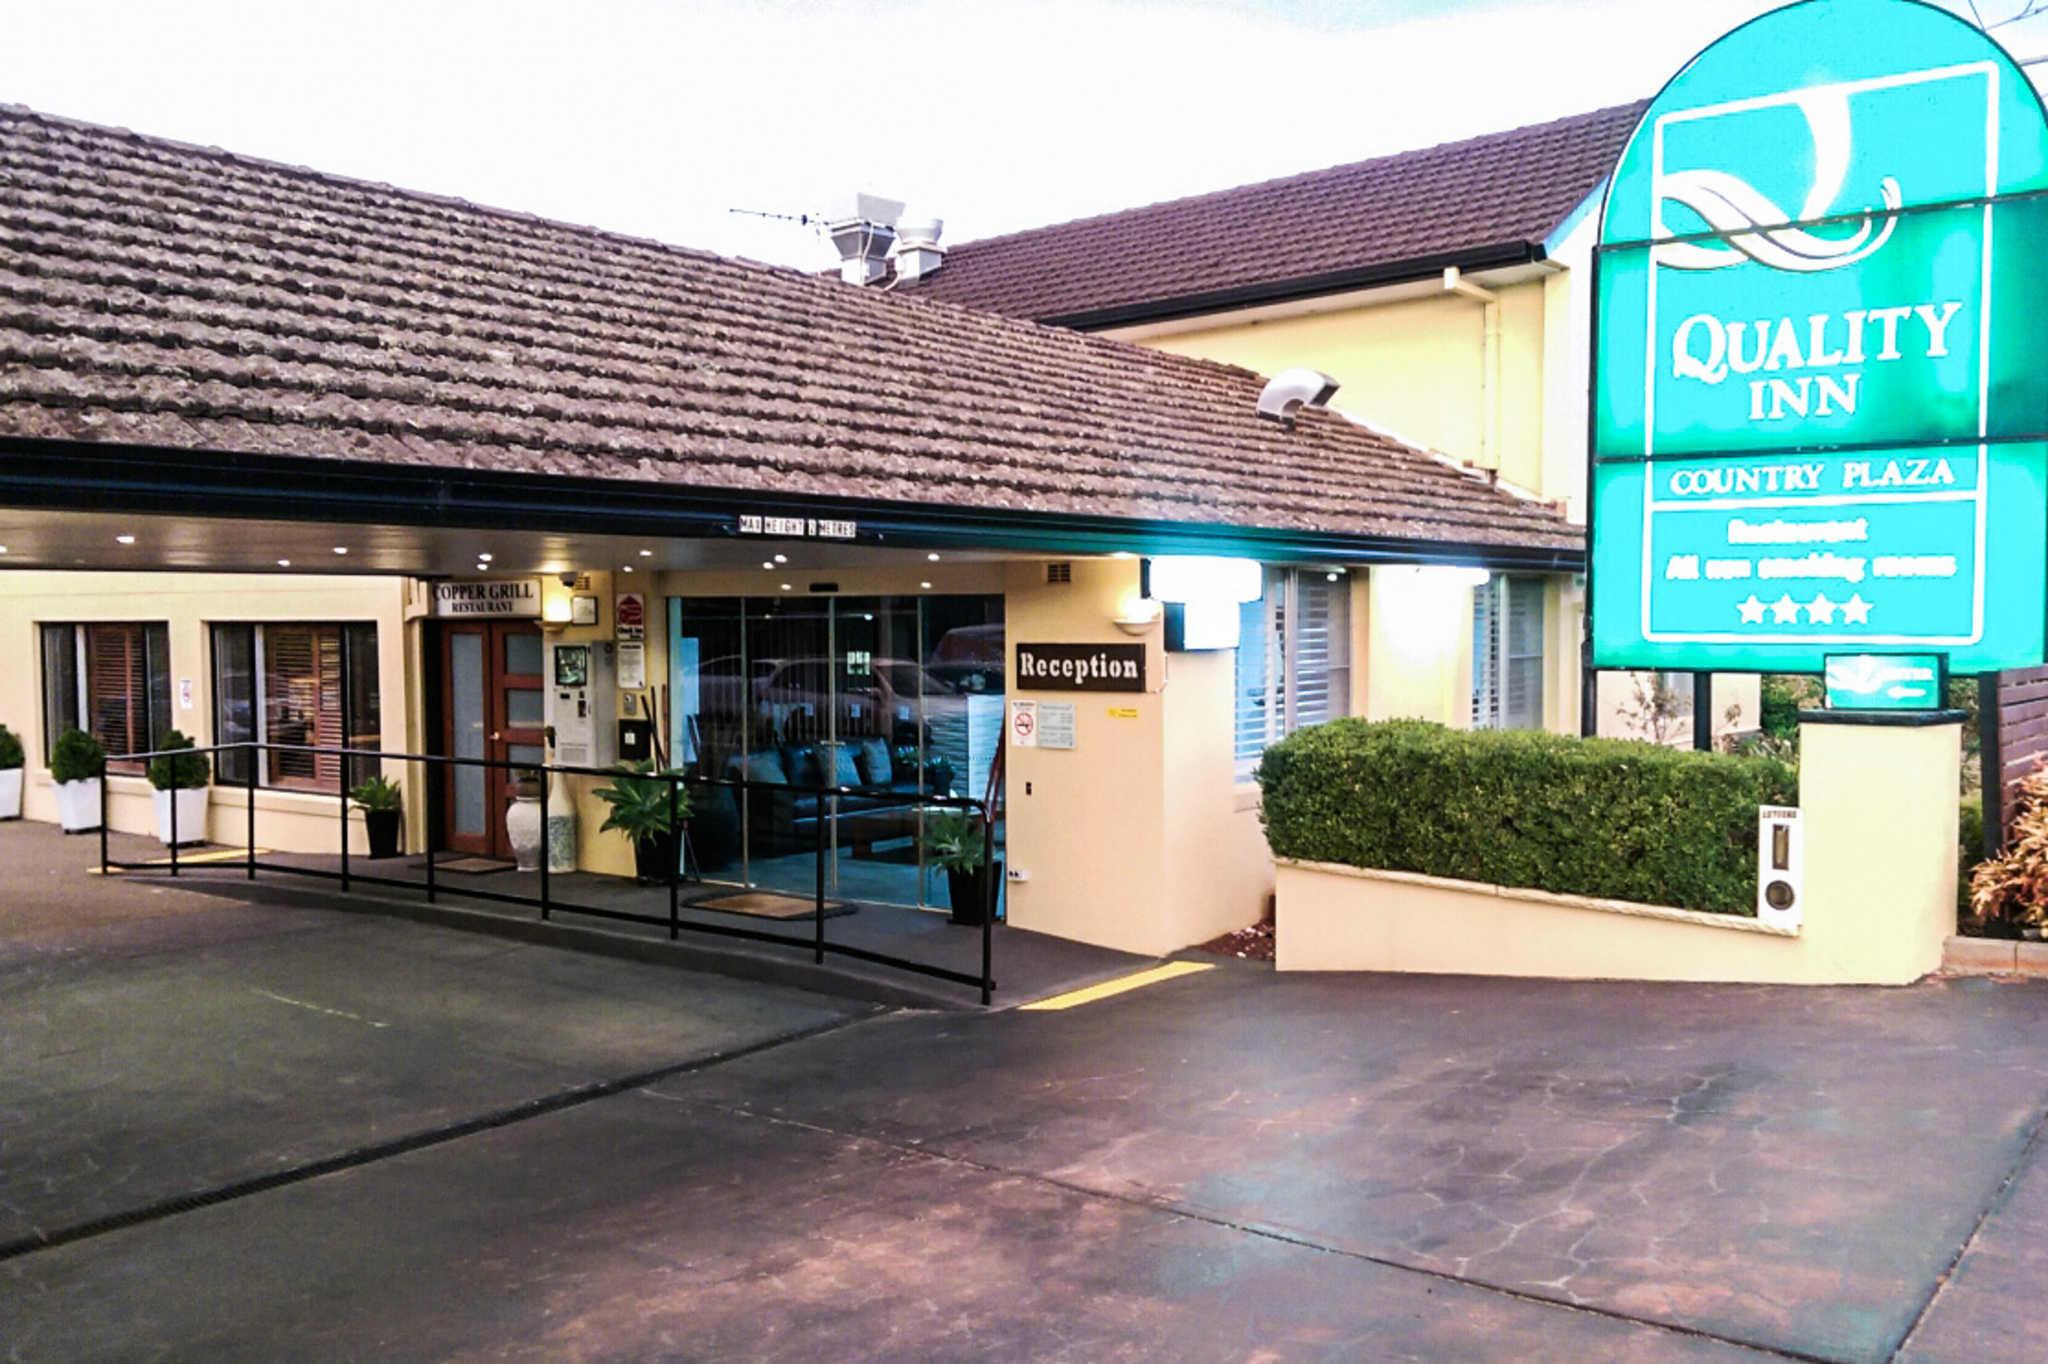 Quality Inn Country Plaza Queanbeyan - Queanbeyan, NSW 2620 - (02) 6297 1211 | ShowMeLocal.com